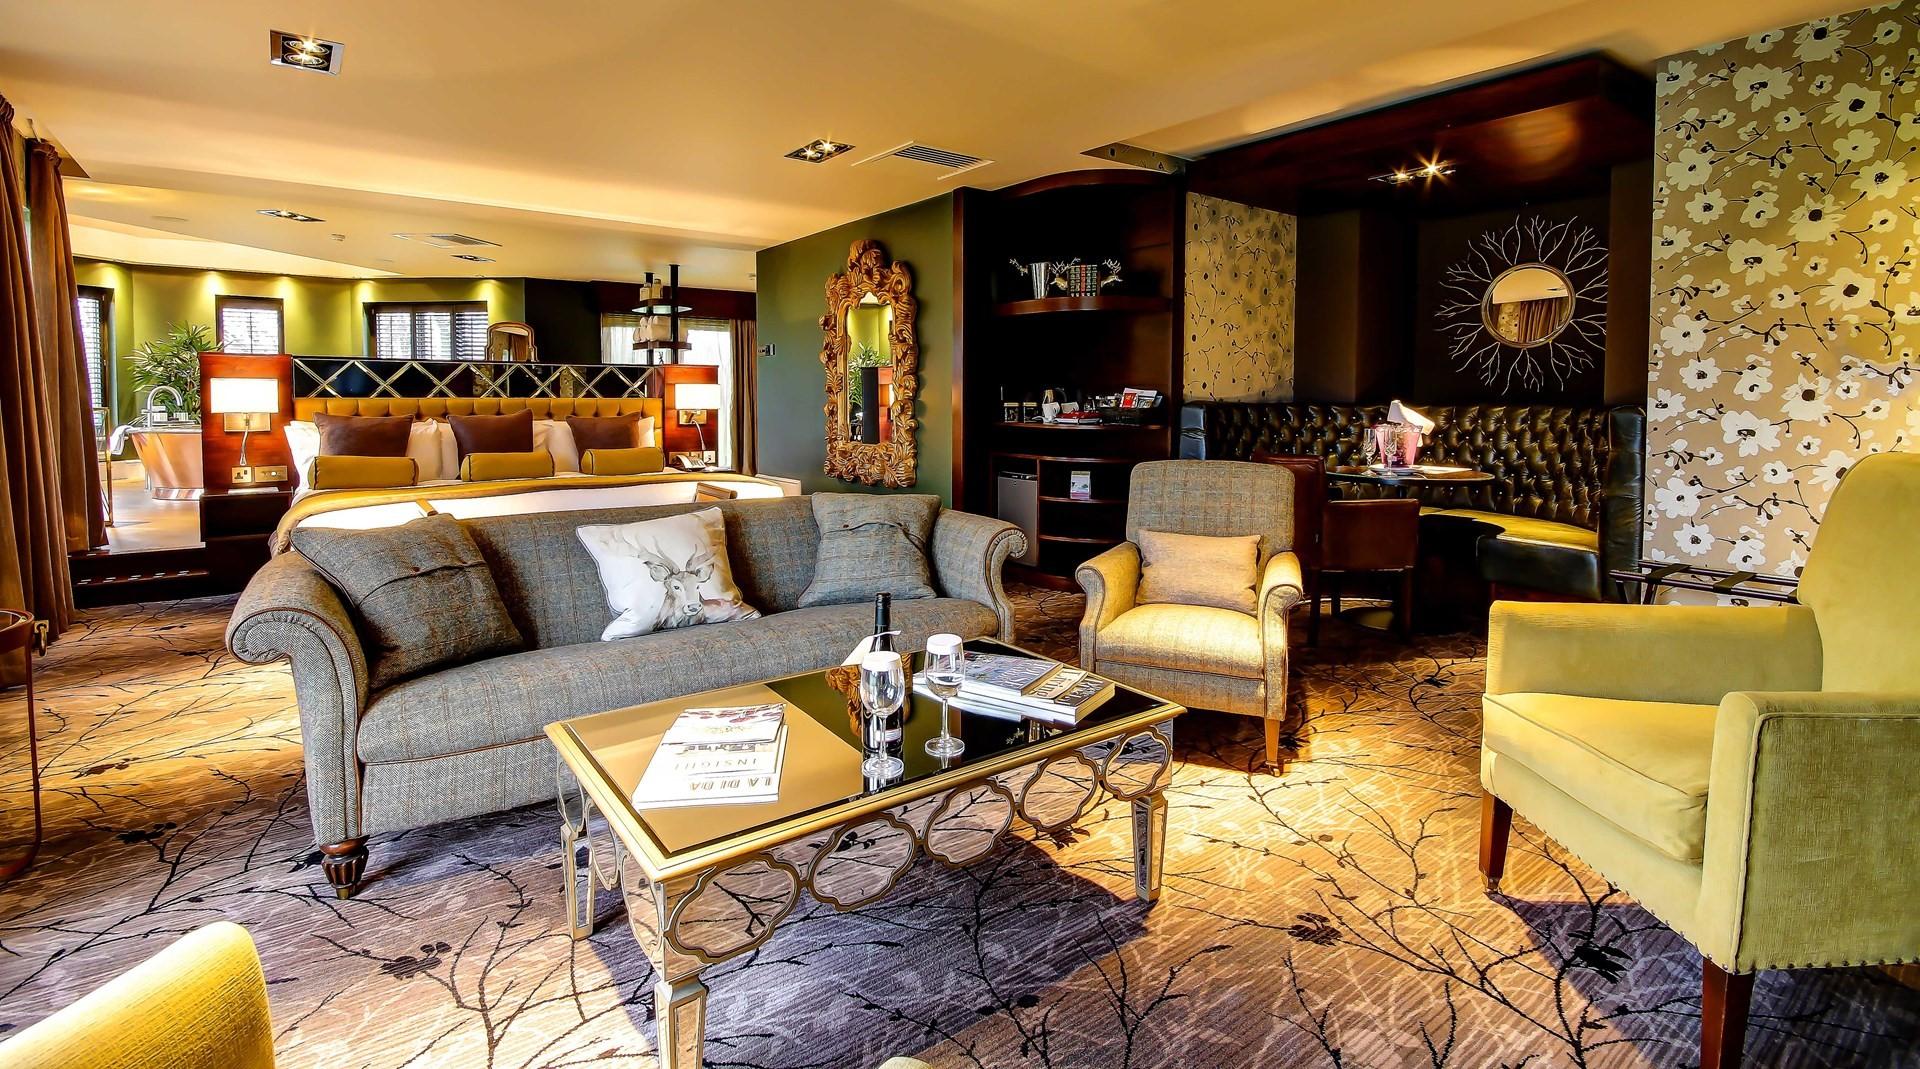 Ramside Hall Luxury Spa Hotel in Durham